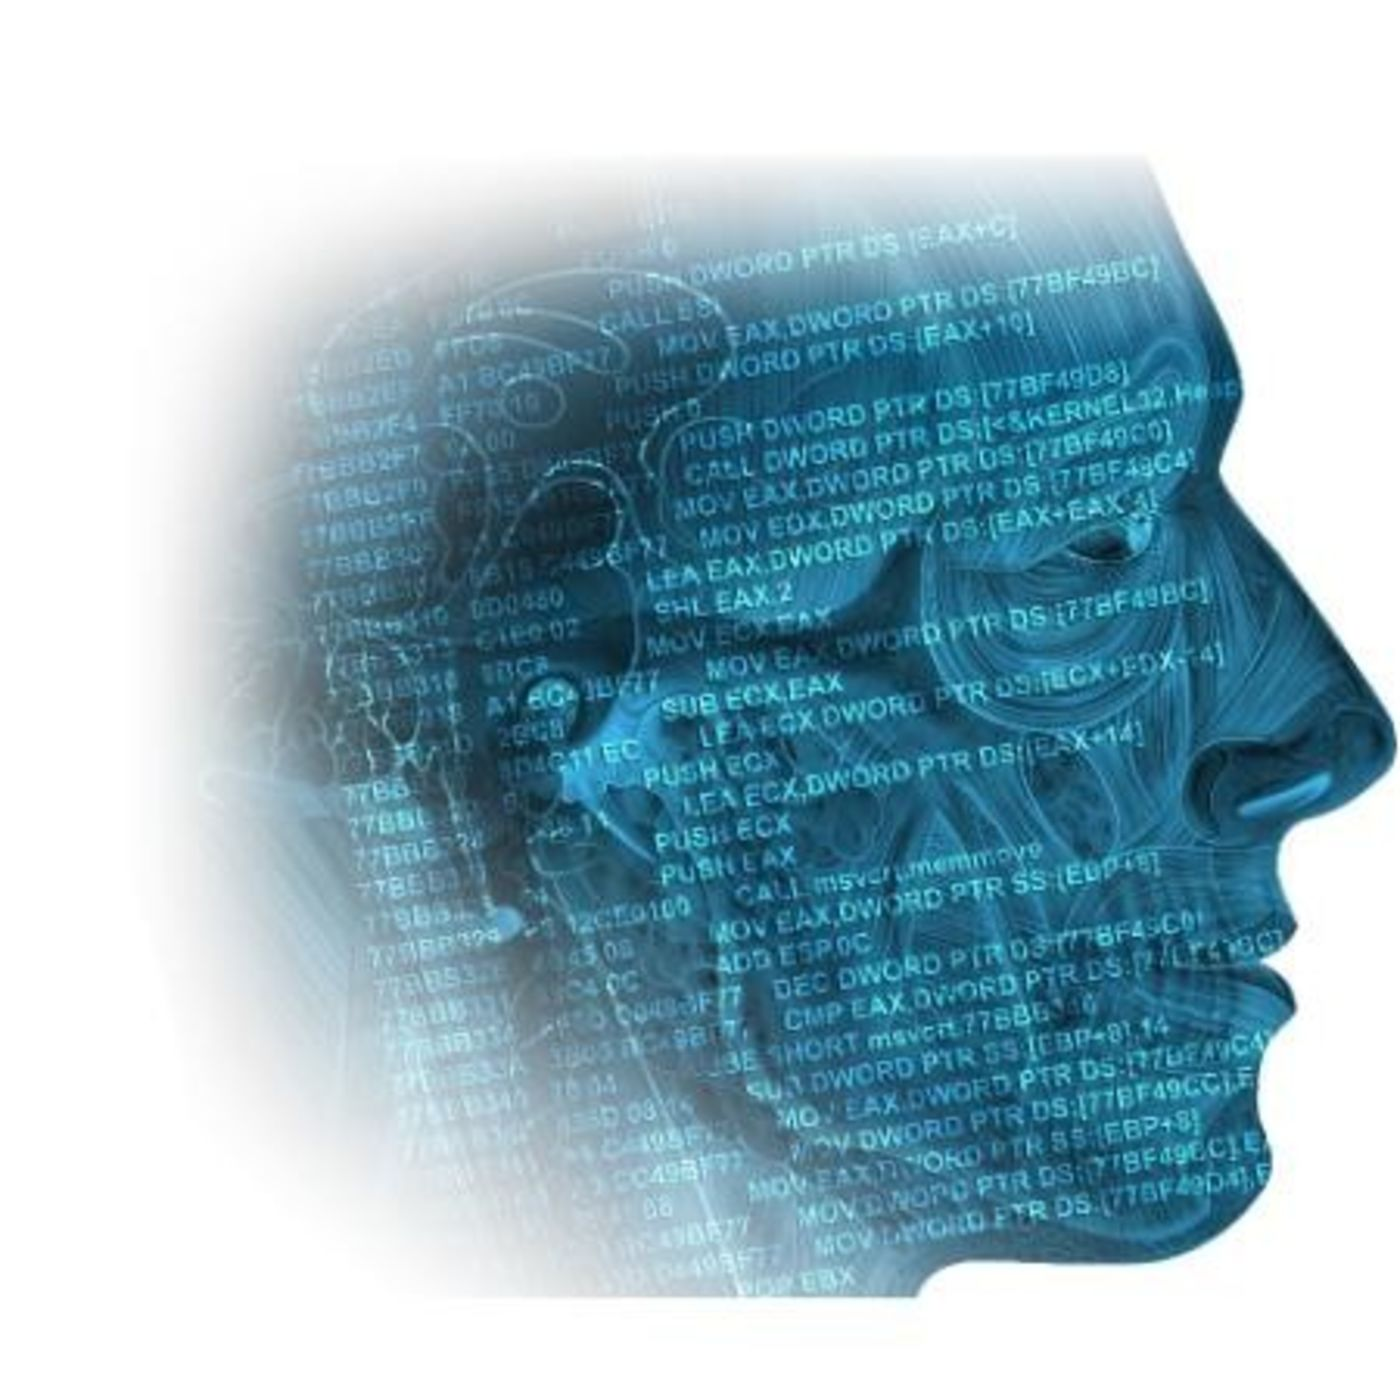 #15 - Chris Hadnagy, CEO, Social-Engineer, LLC - Hacking the Human!